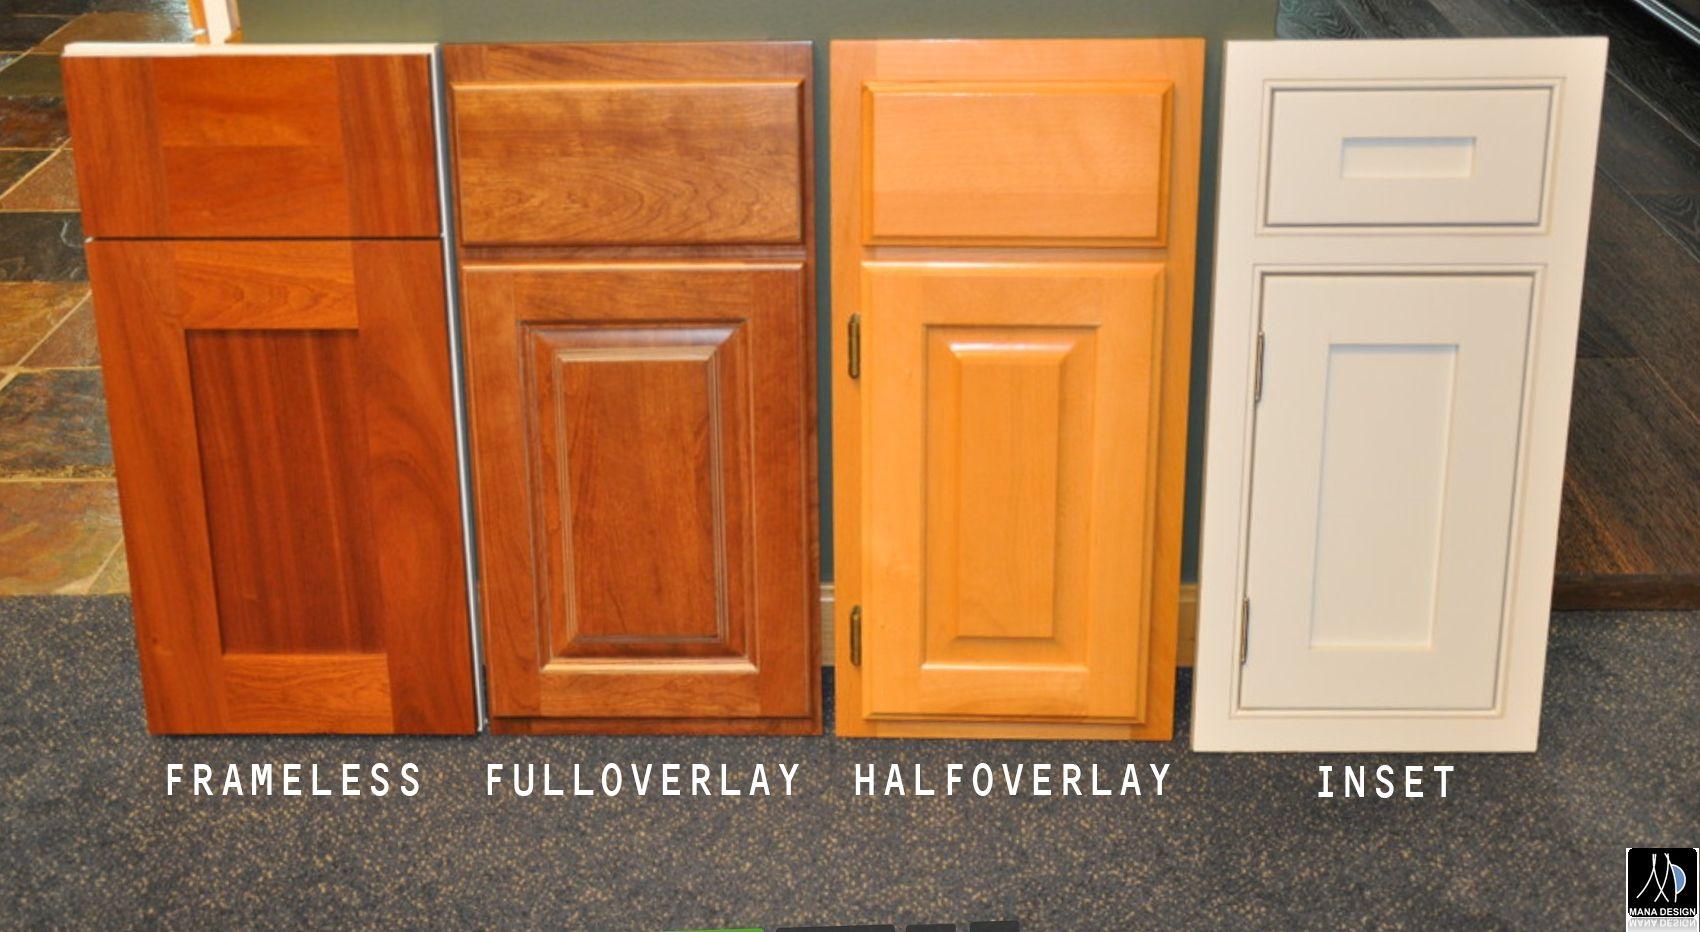 Frameless Cabinet Door Spacing Httpfranzdondi Pinterest